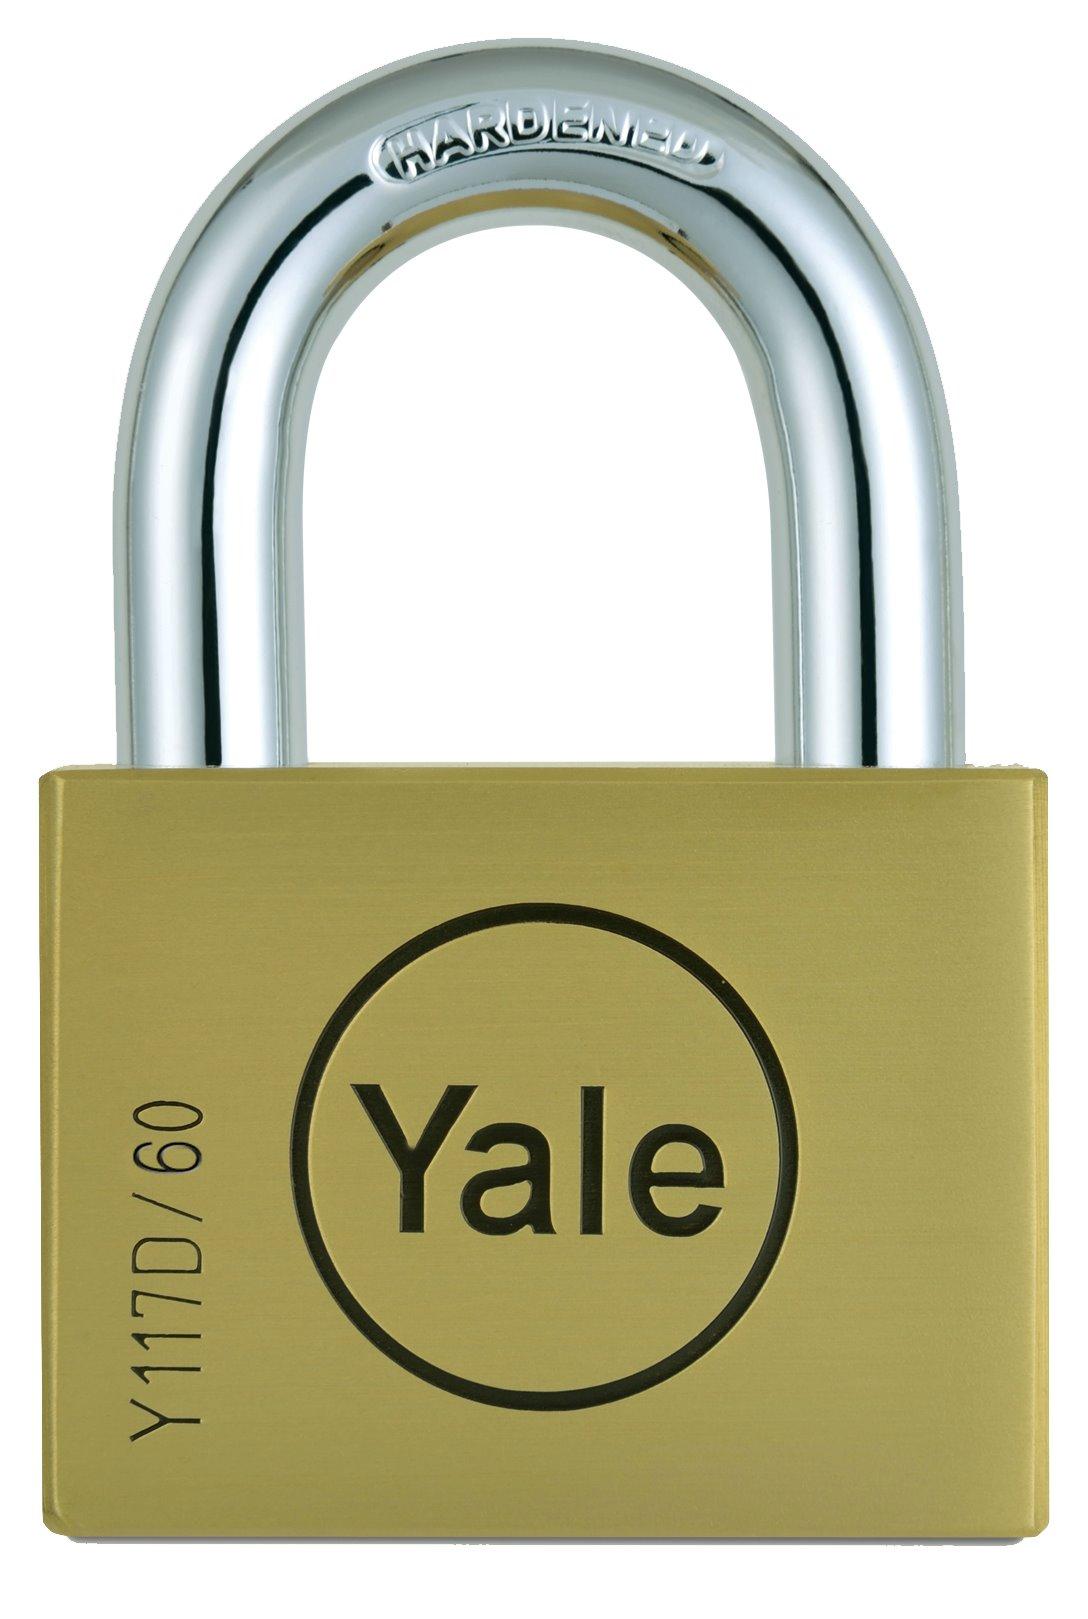 Y117D/60/127 - Yale Disc Padlock 60mm